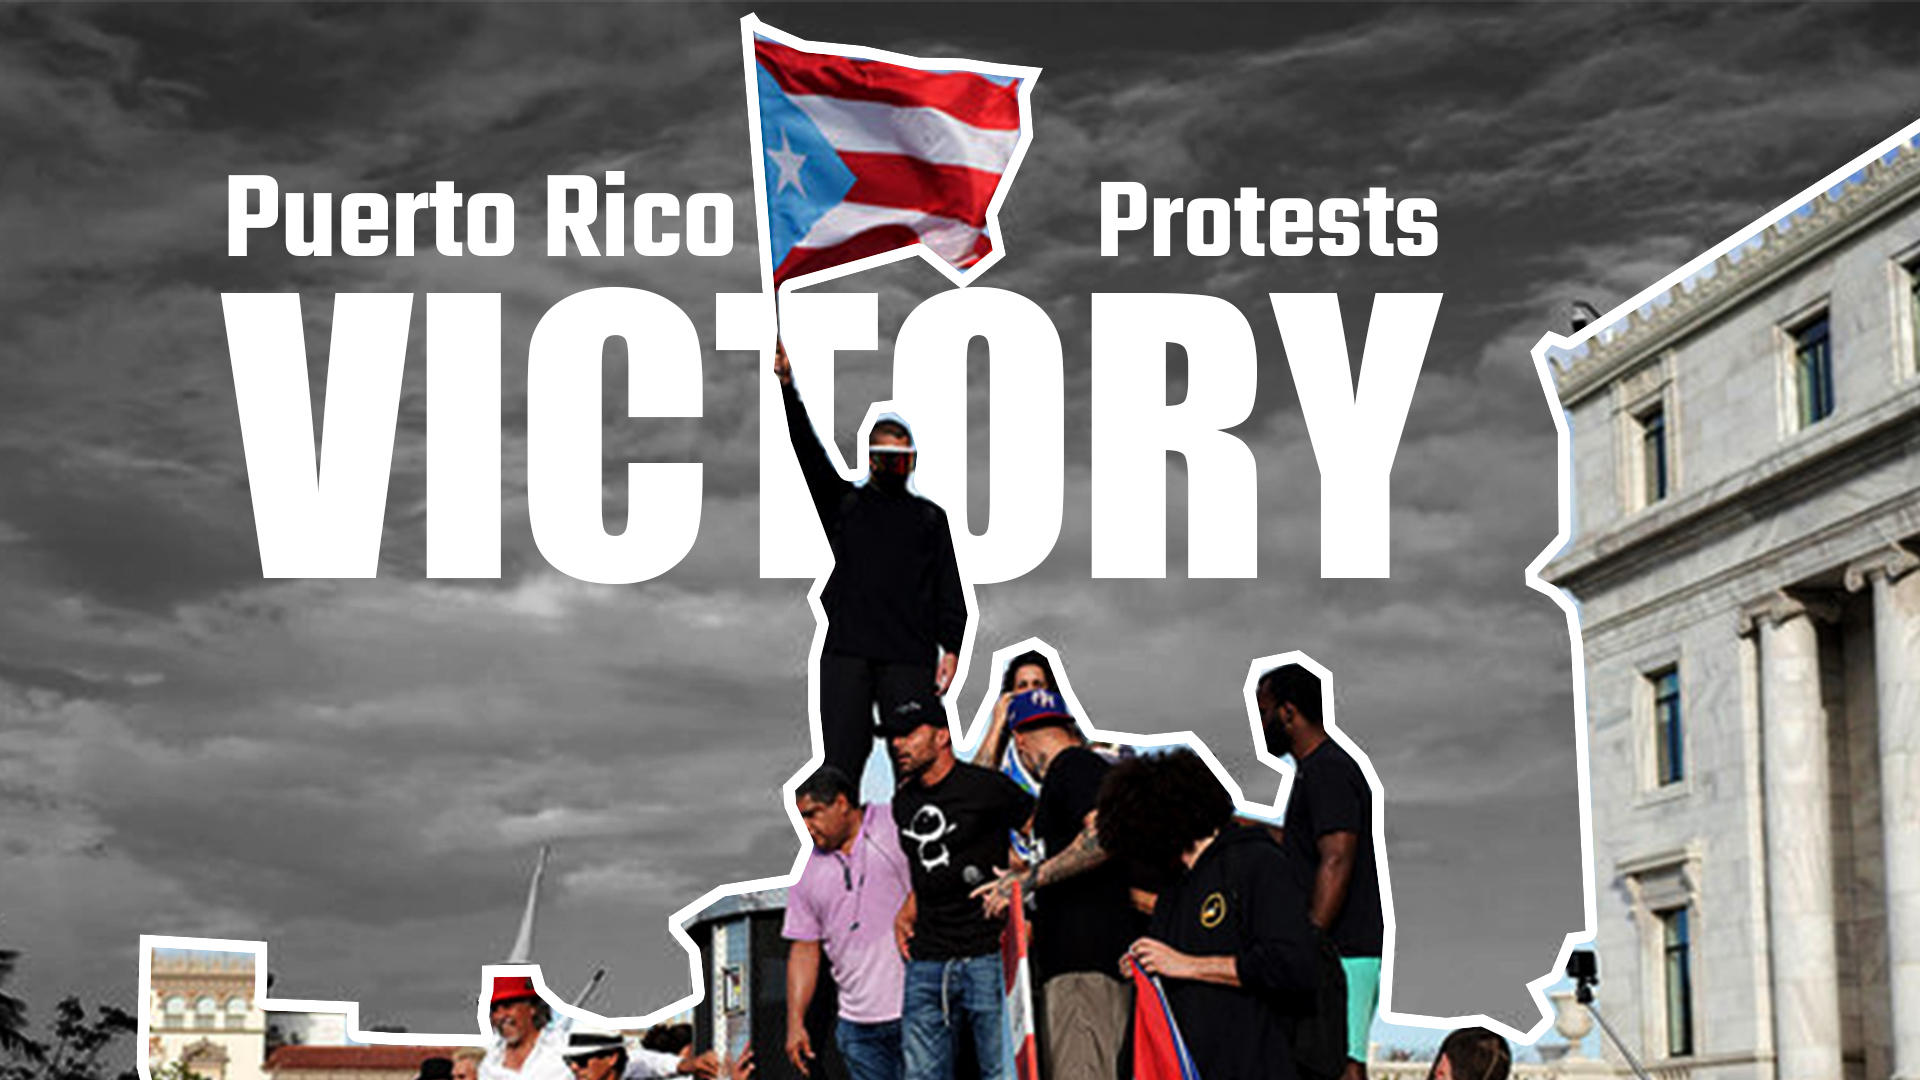 Puerto Rico Protest_Victory